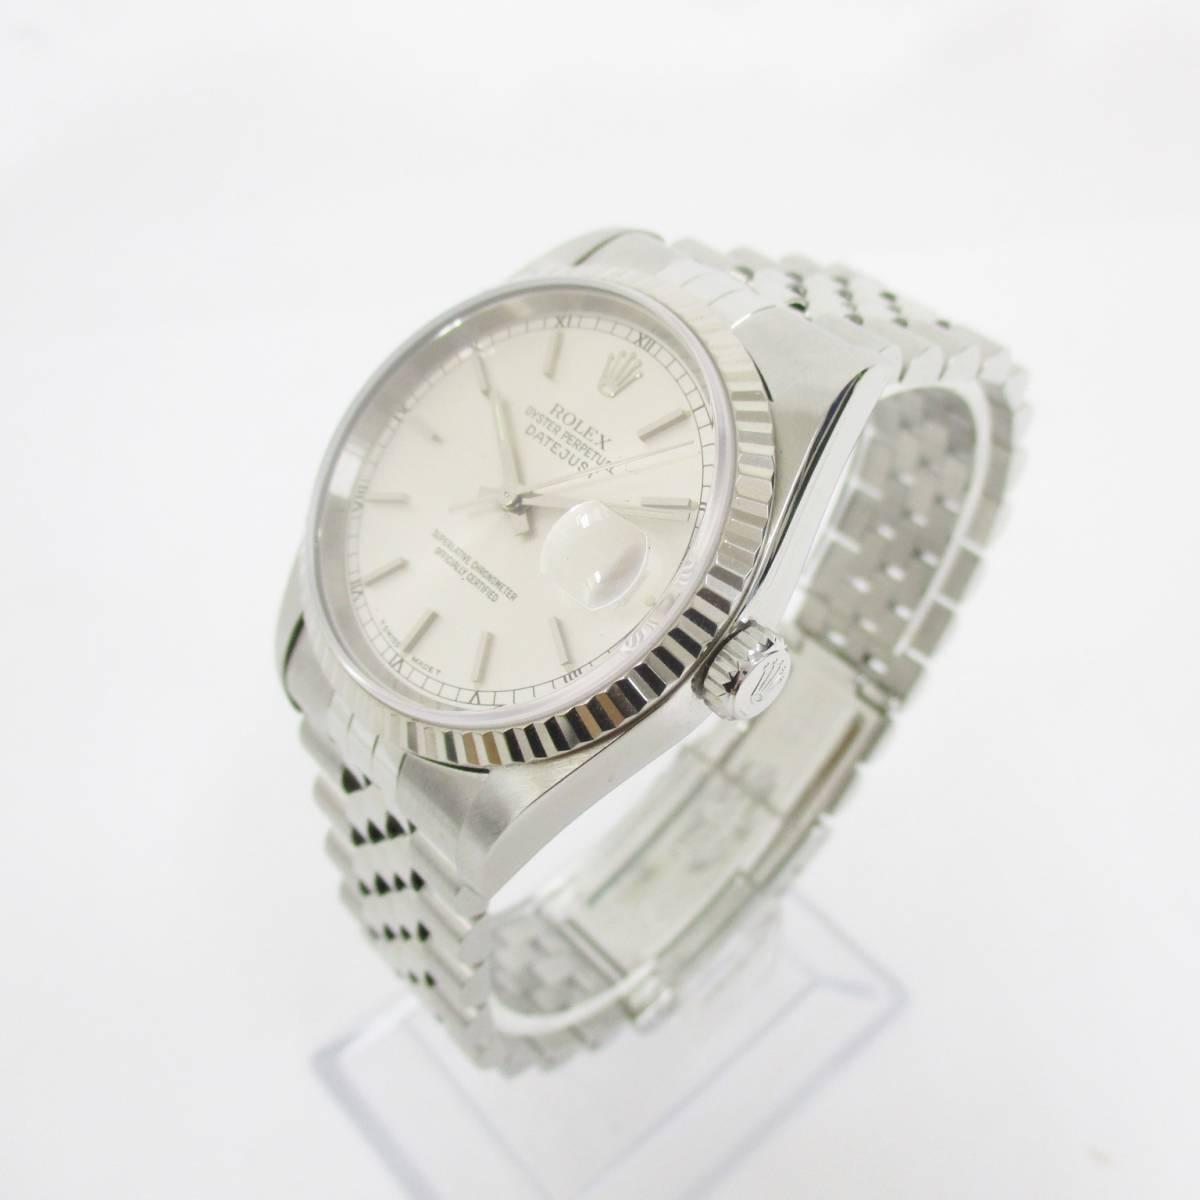 ROLEX ロレックス OYSTER PERPETUAL オイスターパーペチュアル DATEJUST デイトジャスト 16234 T番 メンズ 腕時計 自動巻き 大ReB08 0522 2_画像3